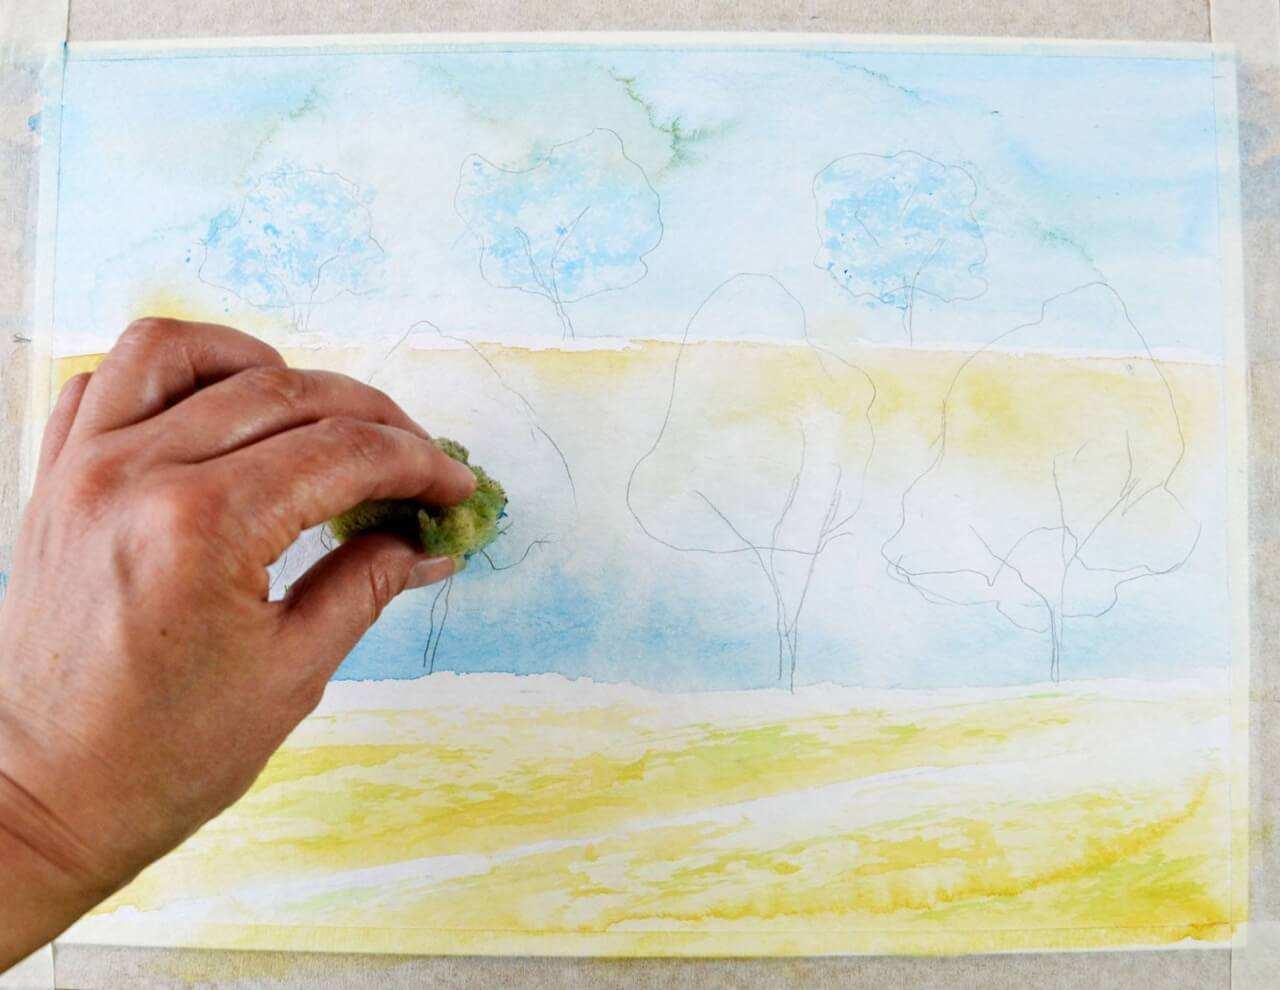 Onlinekurs Aquarellmalerei Fur Anfanger